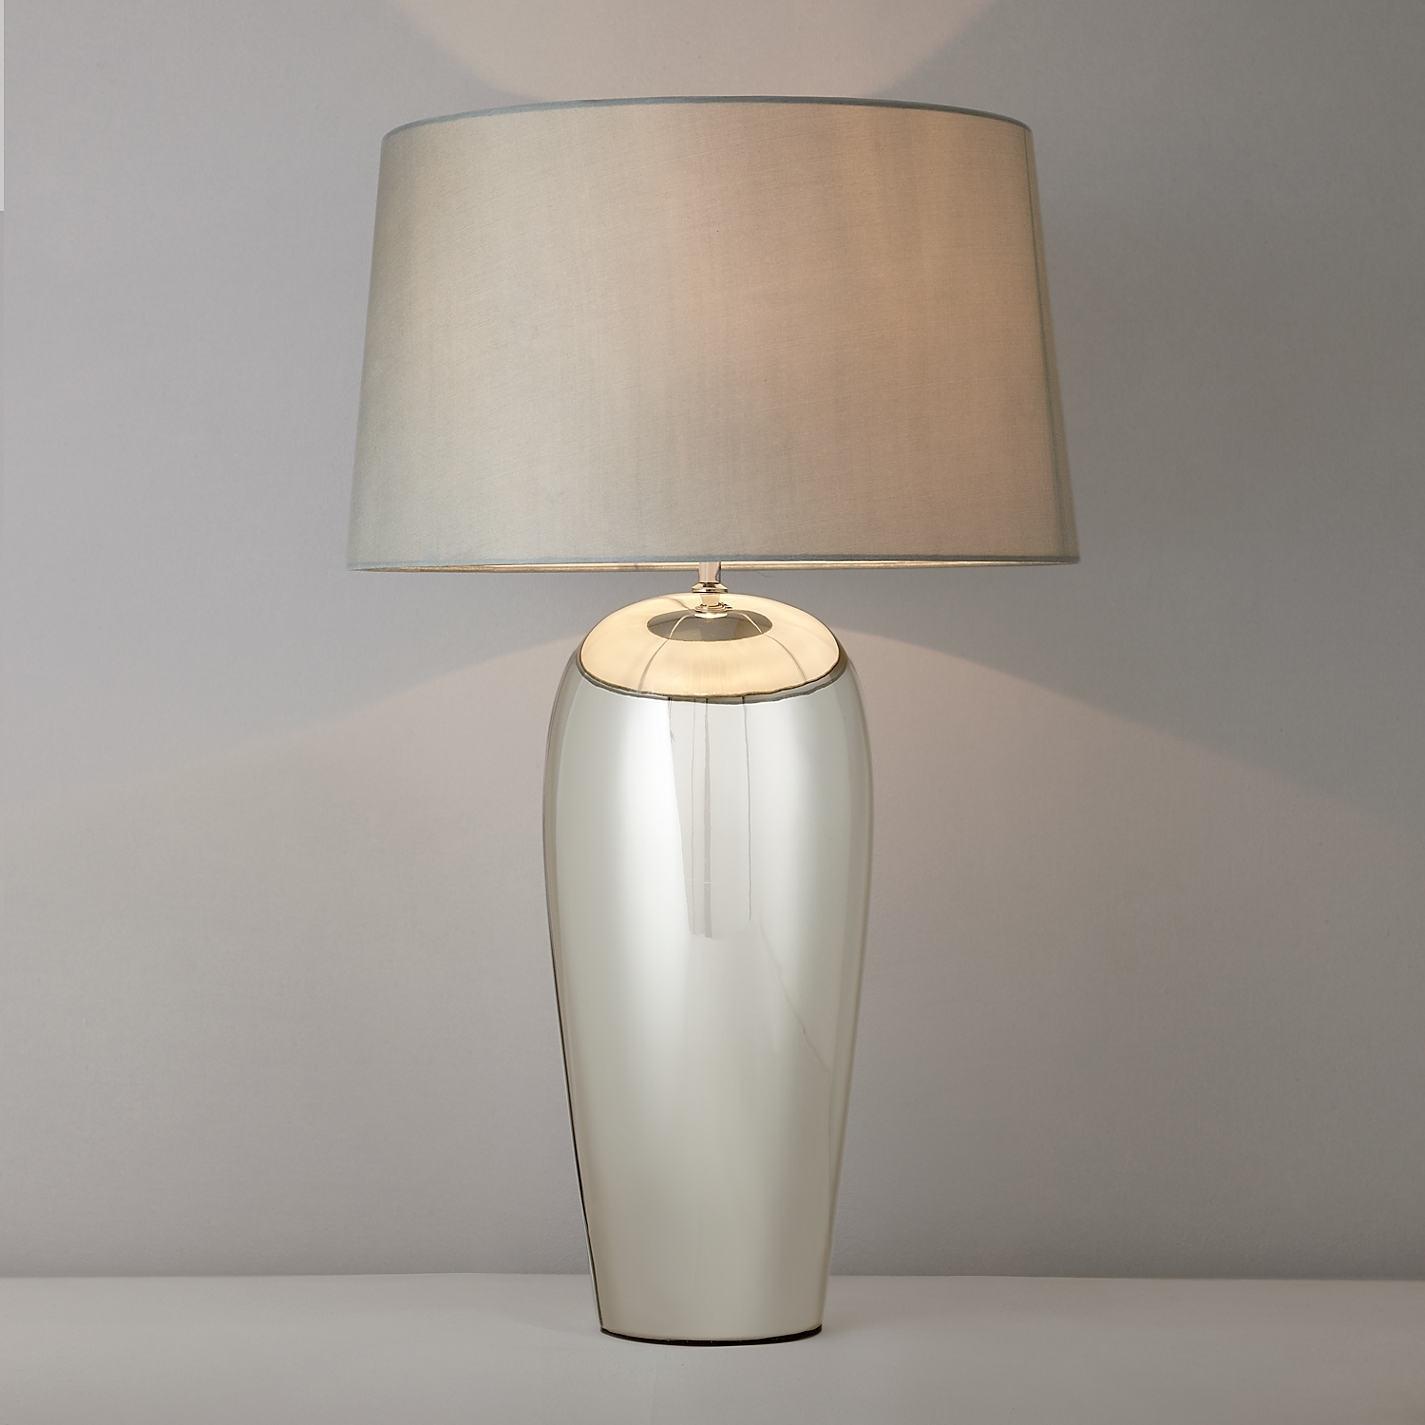 Gallery John Lewis Table Lamps – Badotcom Throughout John Lewis Living Room Table Lamps (#4 of 15)